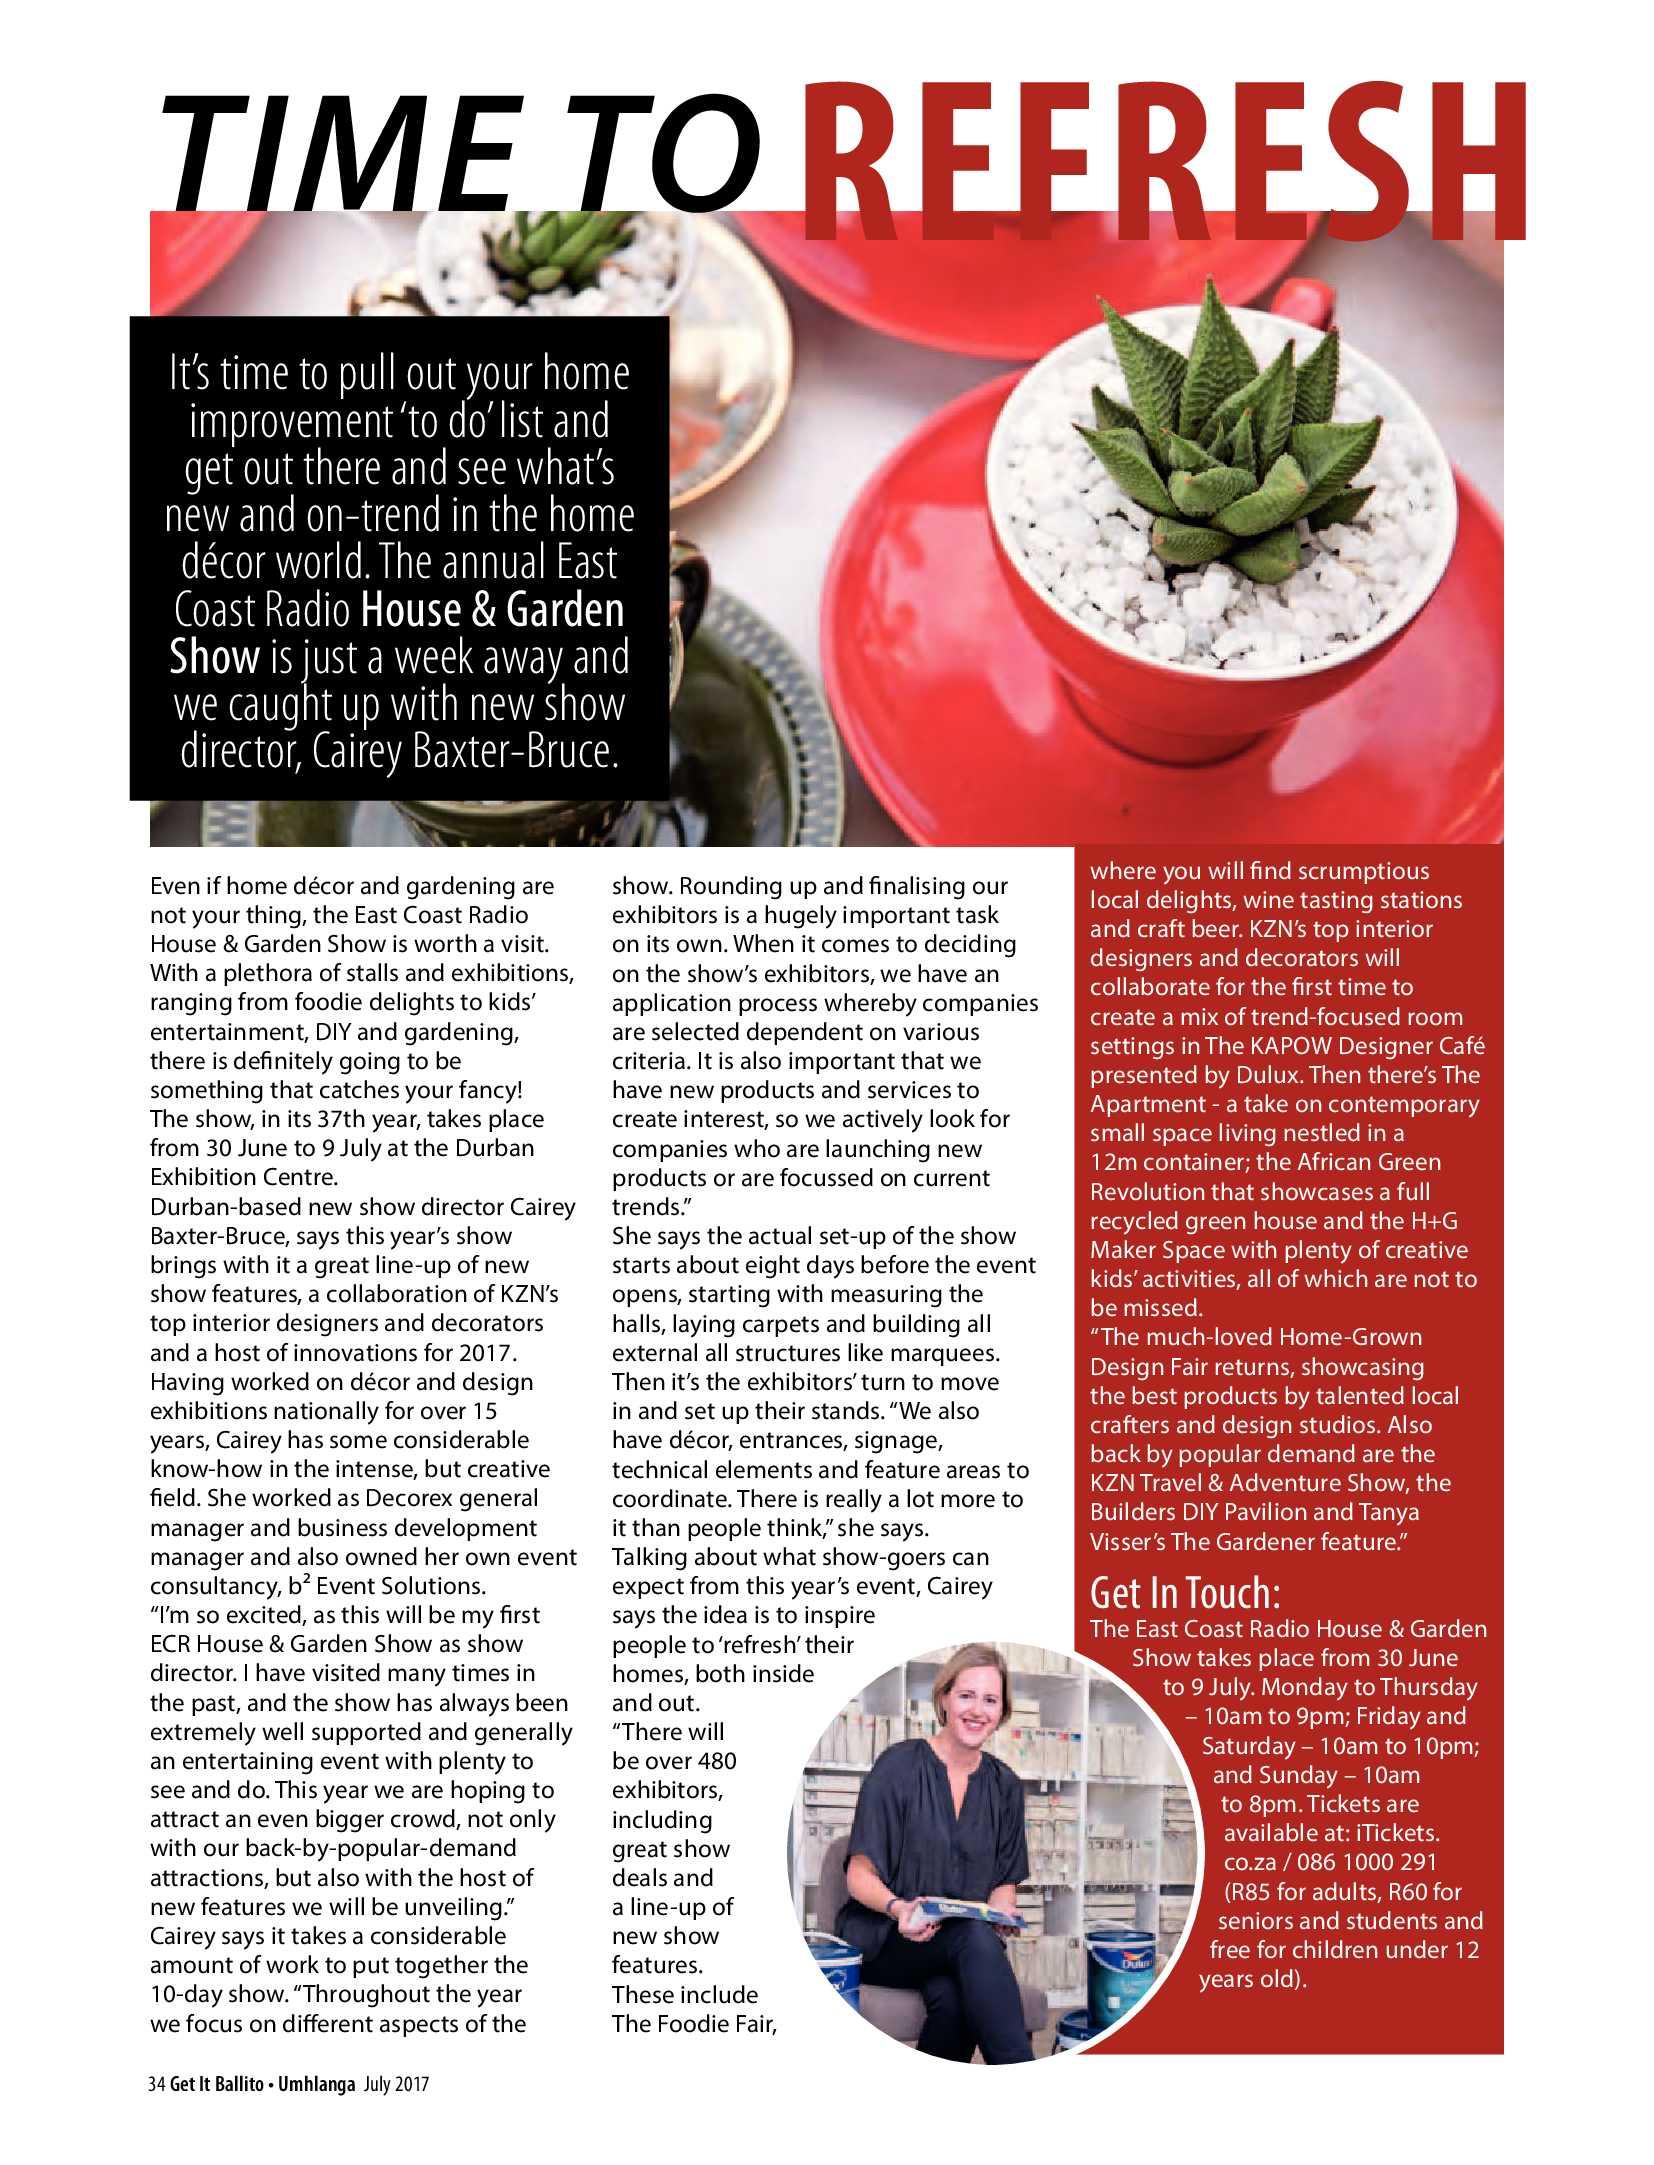 get-magazine-ballitoumhlanga-july-2017-2-epapers-page-36